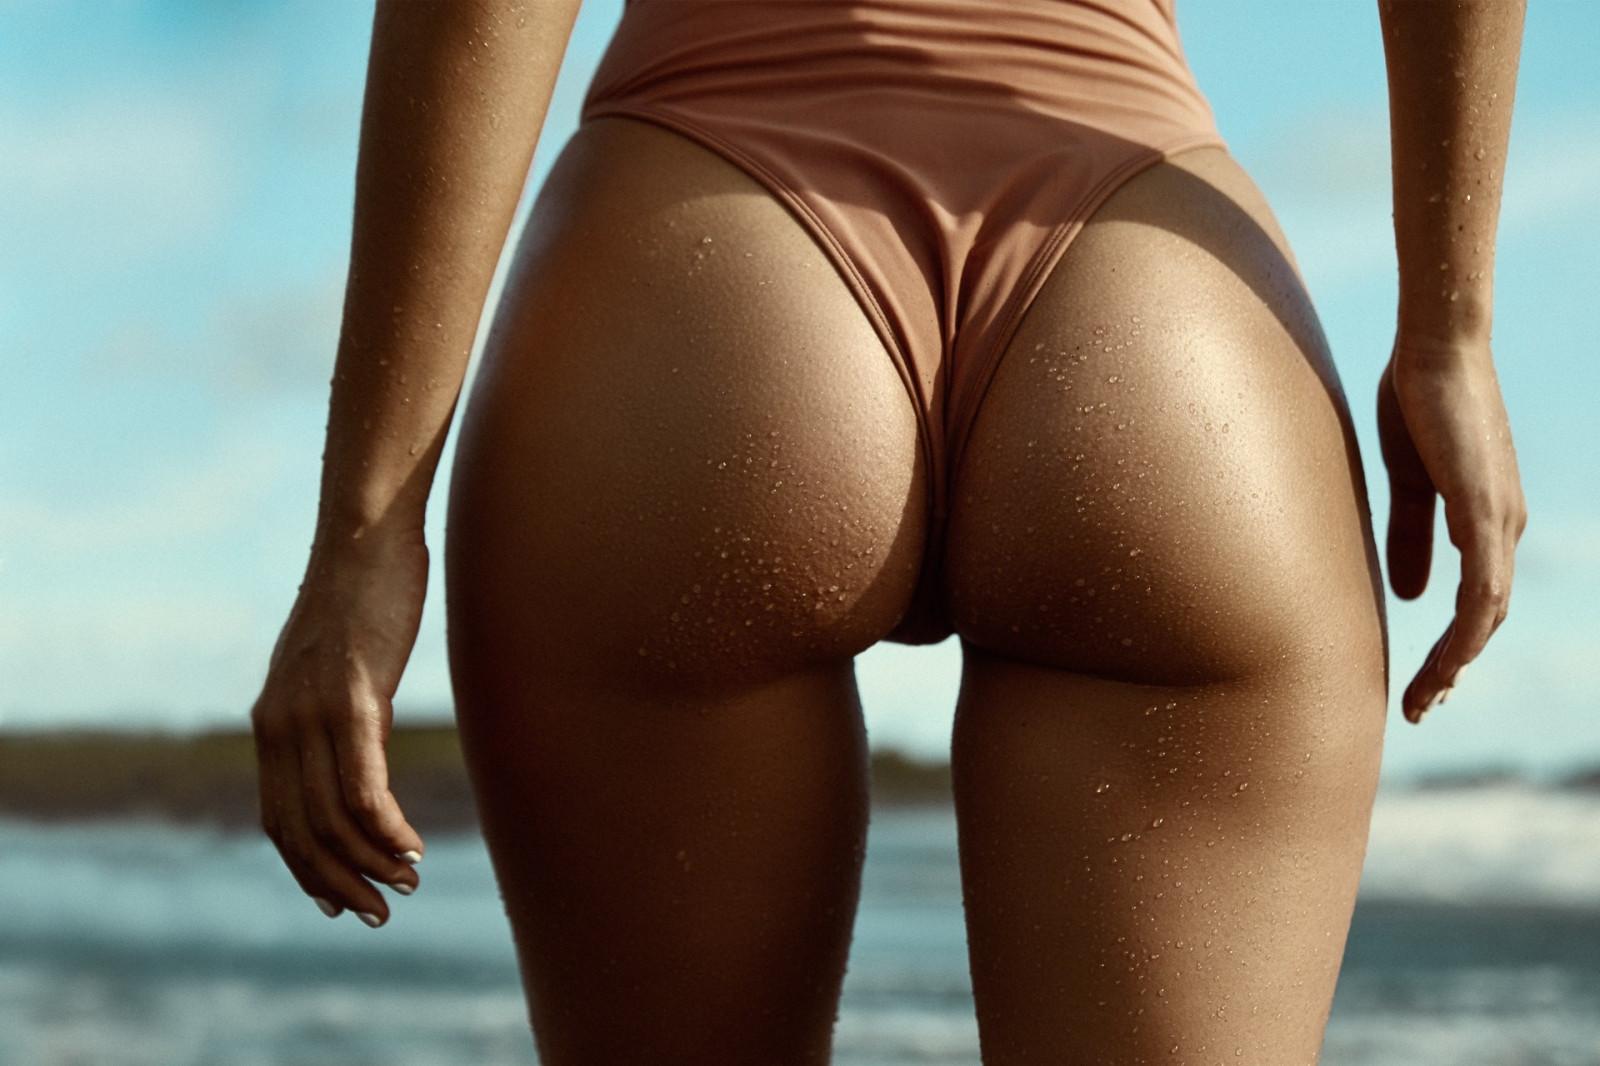 Фото жопы онлайн, жопотряска красивых задниц